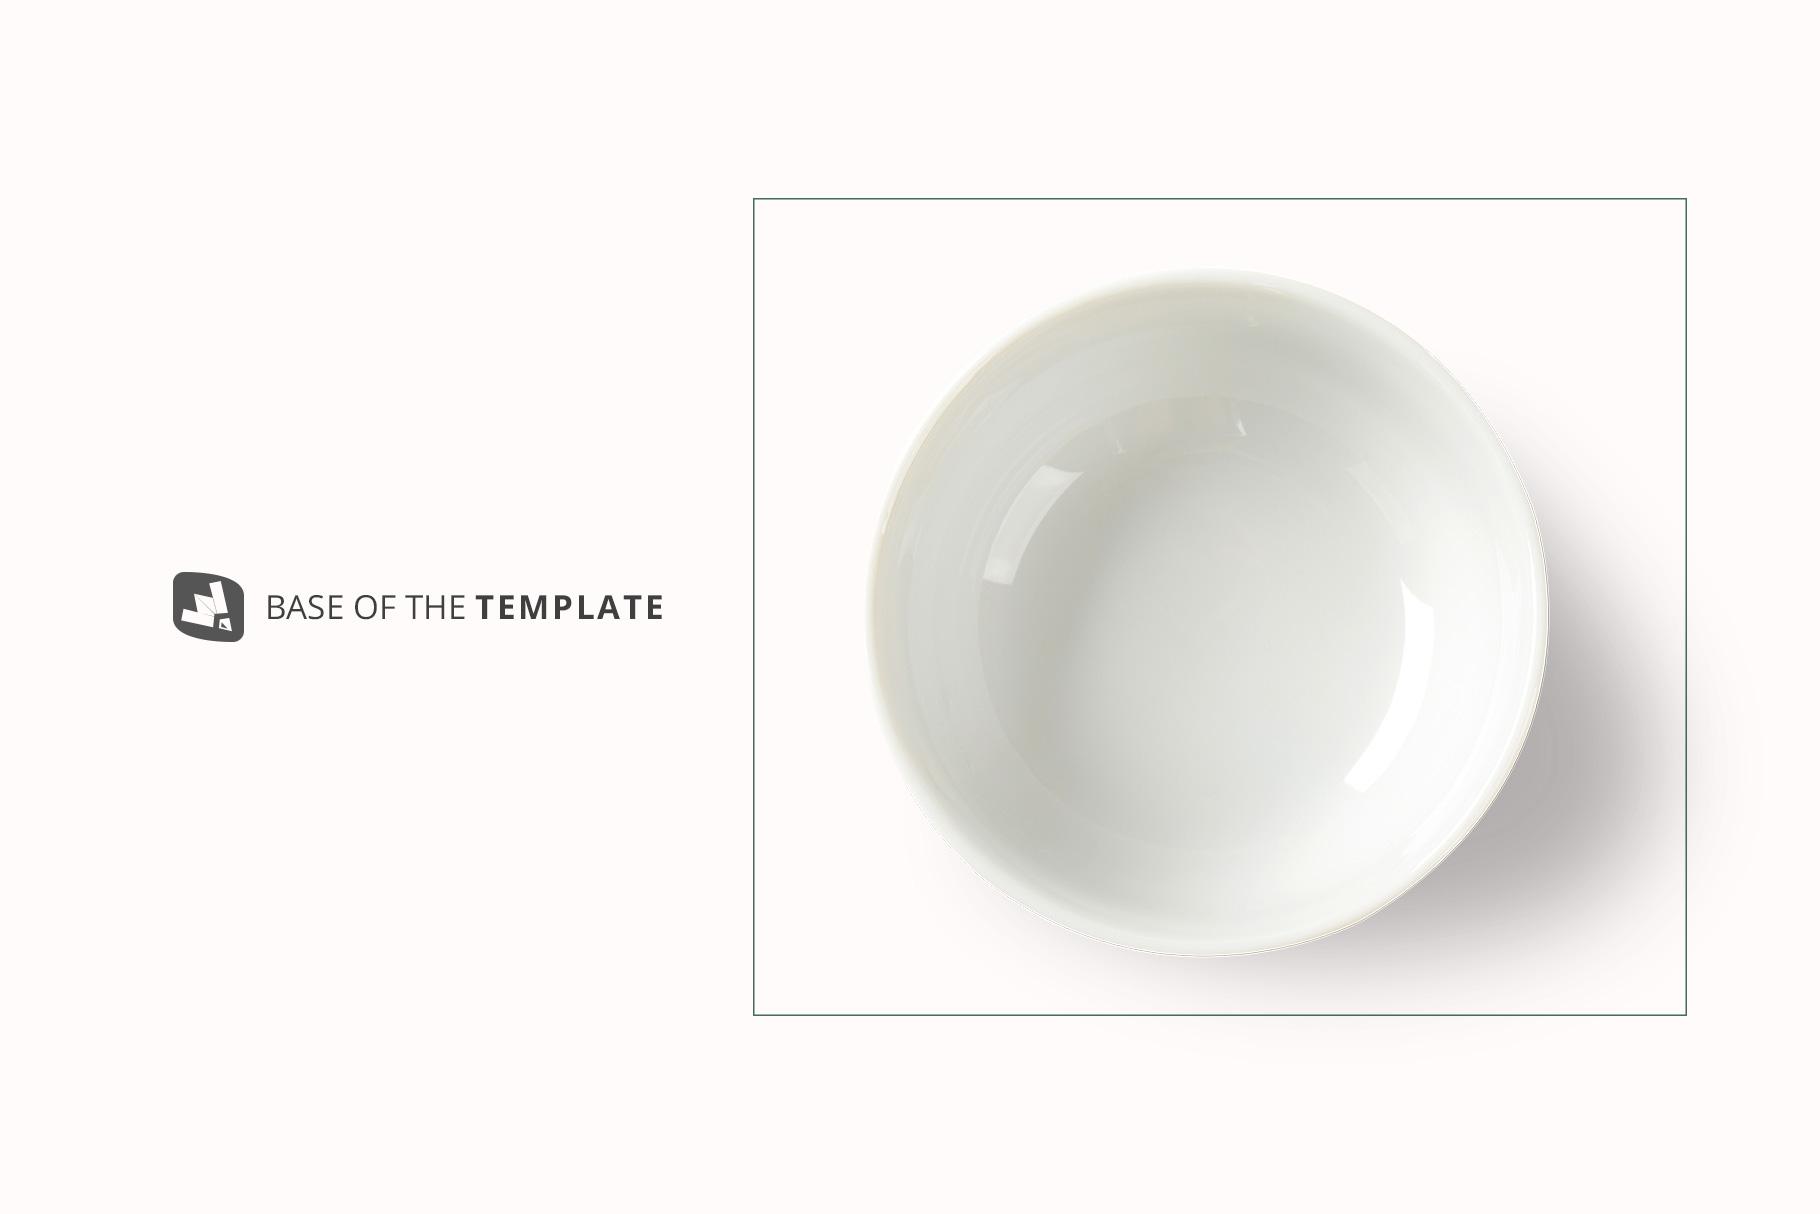 base image of the top view deep ceramic bowl mockup